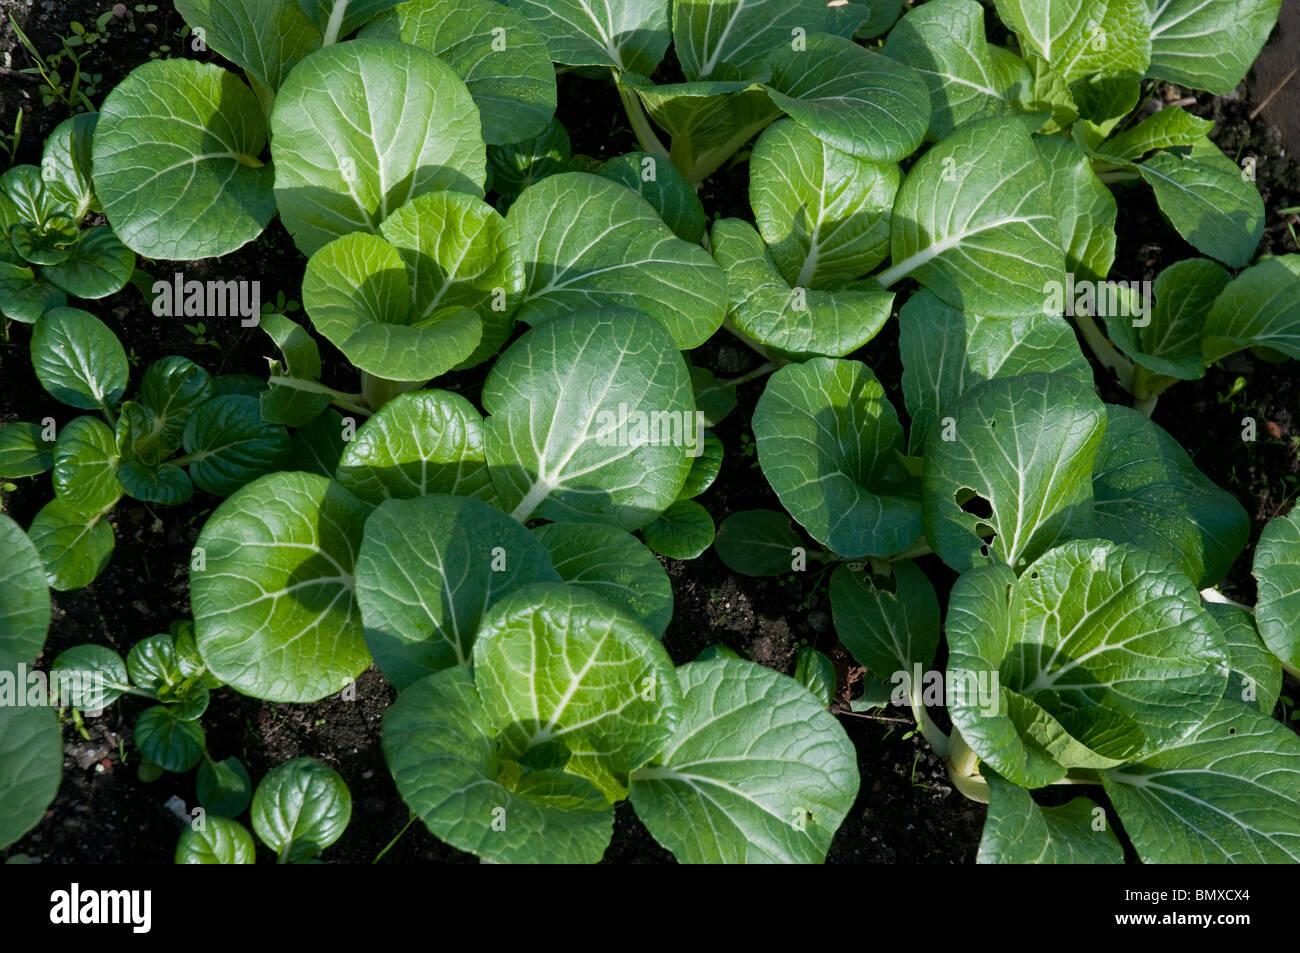 White stem Bok choy scientific name Brassica rapa Chinensis - Stock Image